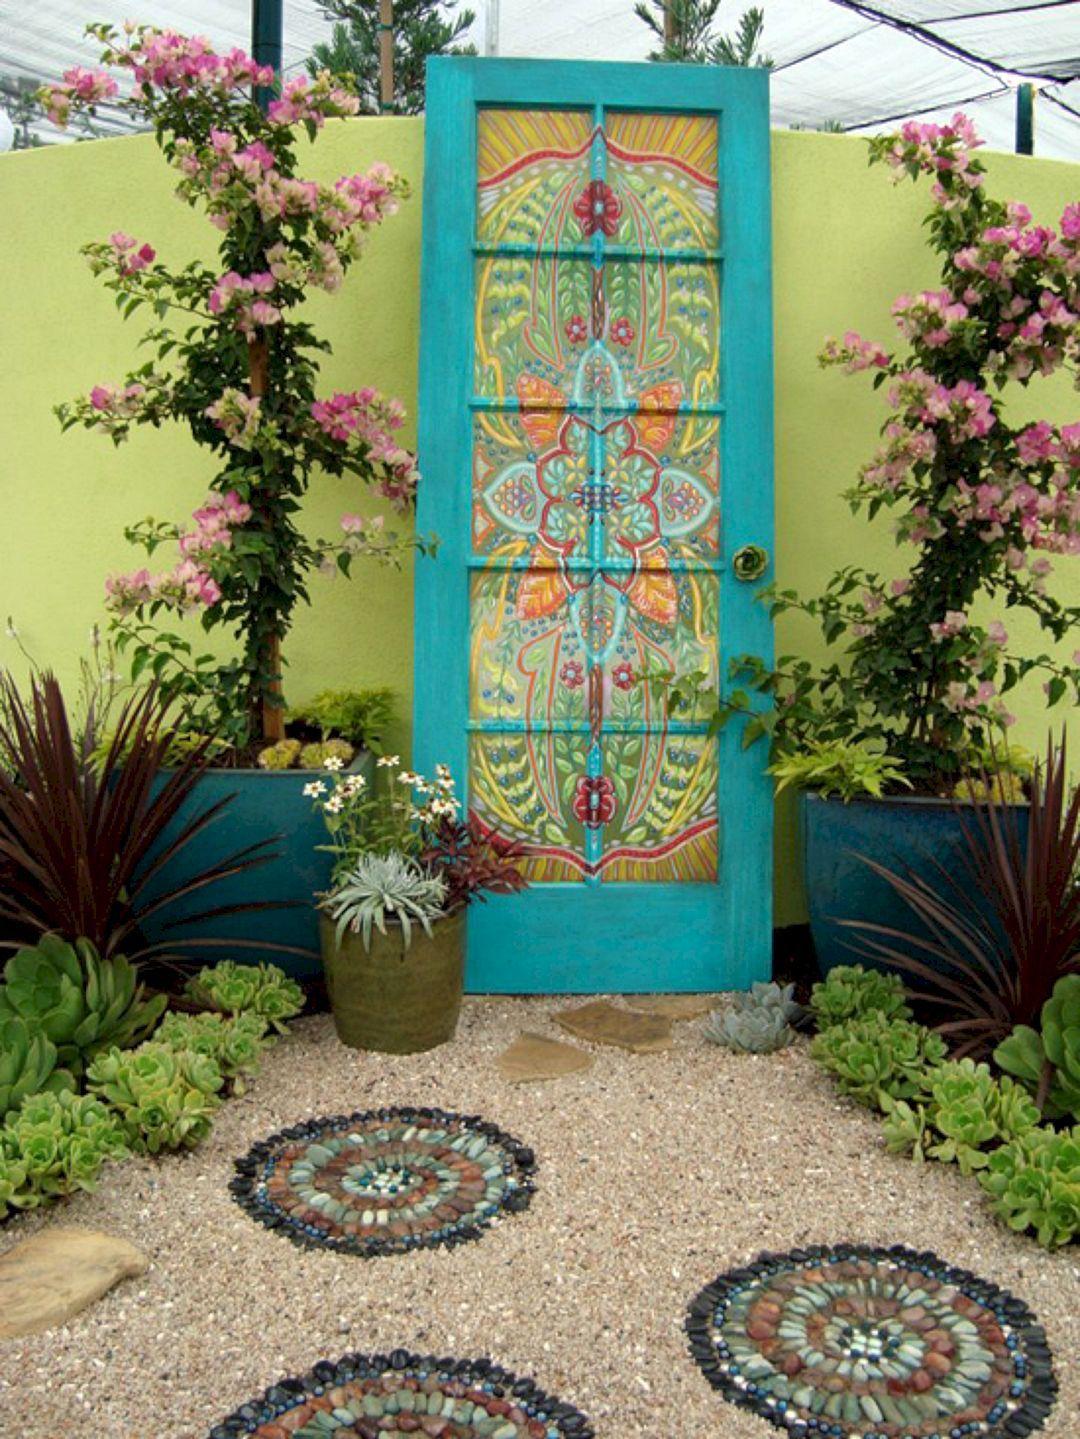 Awesome Vintage Garden Decor Ideas Vintage Garden Decor Bohemian Garden Garden Art